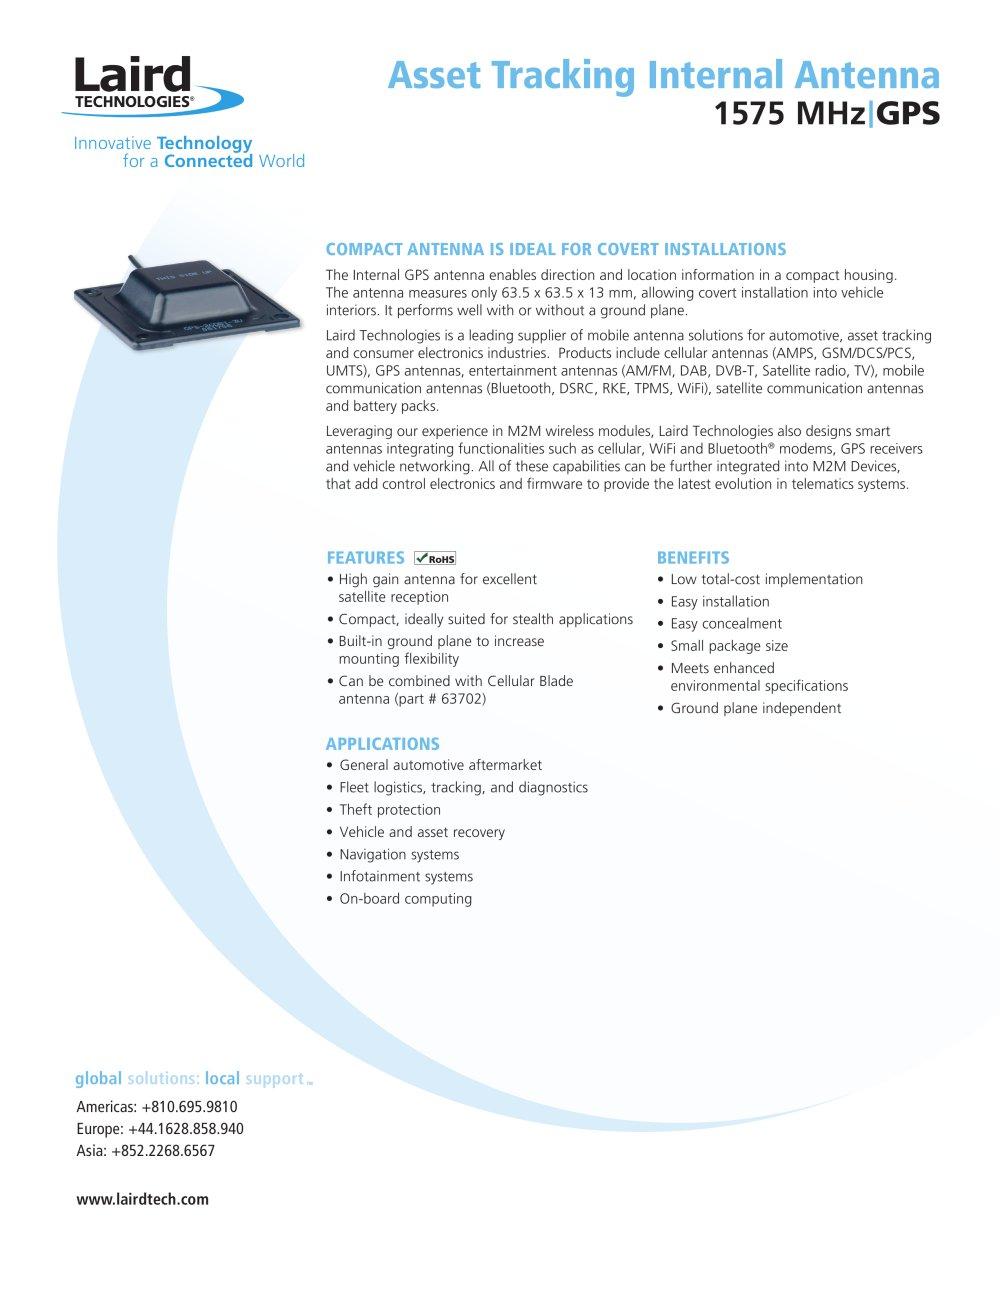 Gps Technology Pdf